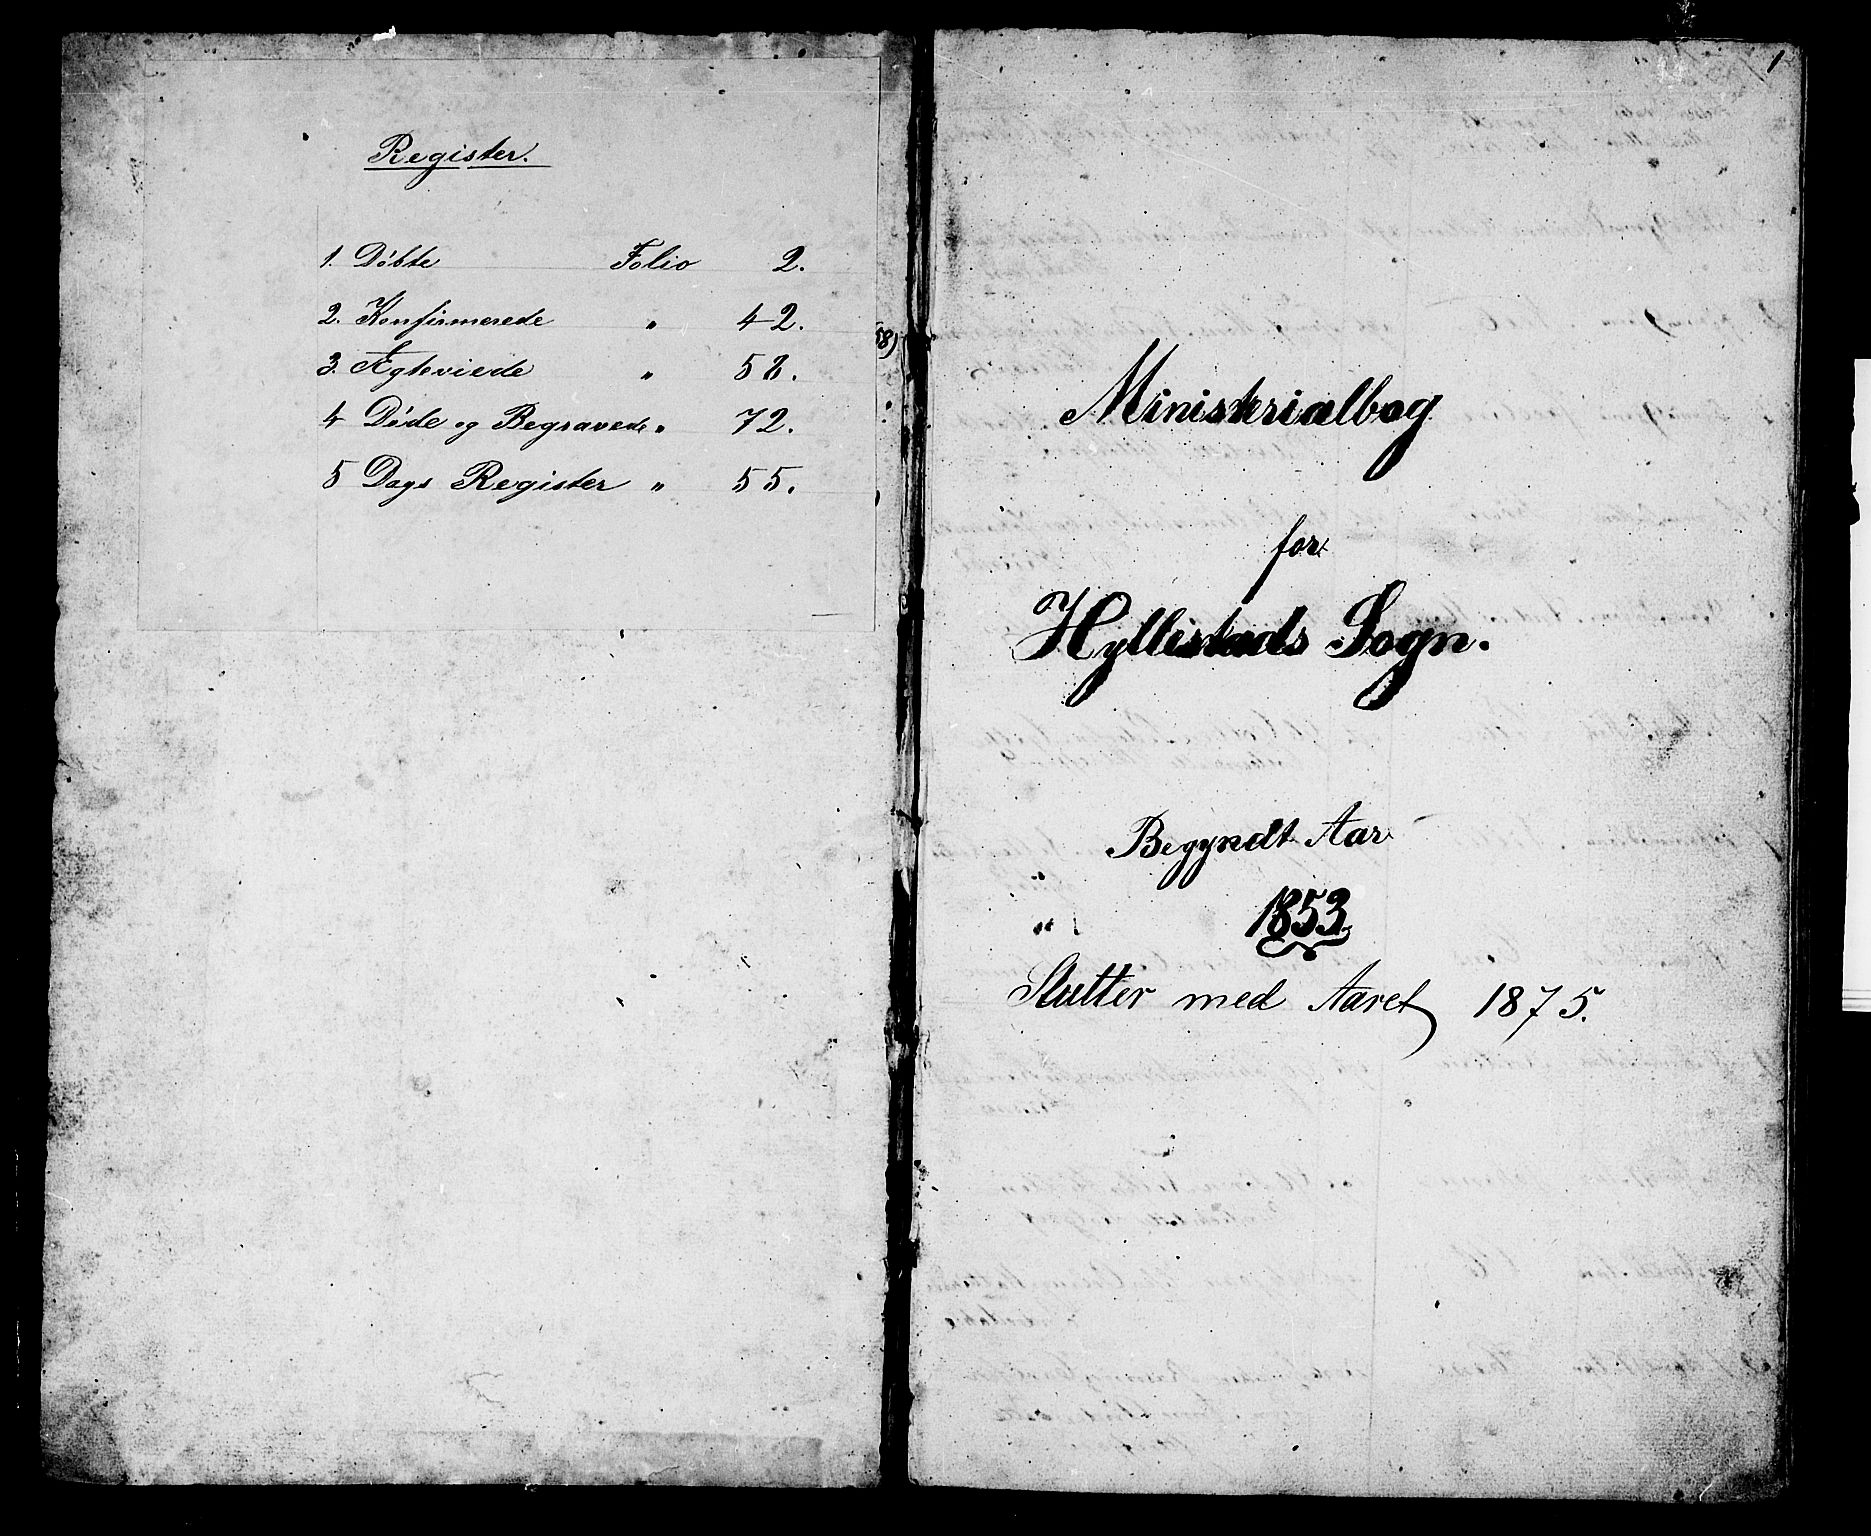 SAB, Hyllestad Sokneprestembete, Klokkerbok nr. A 1, 1853-1875, s. 1